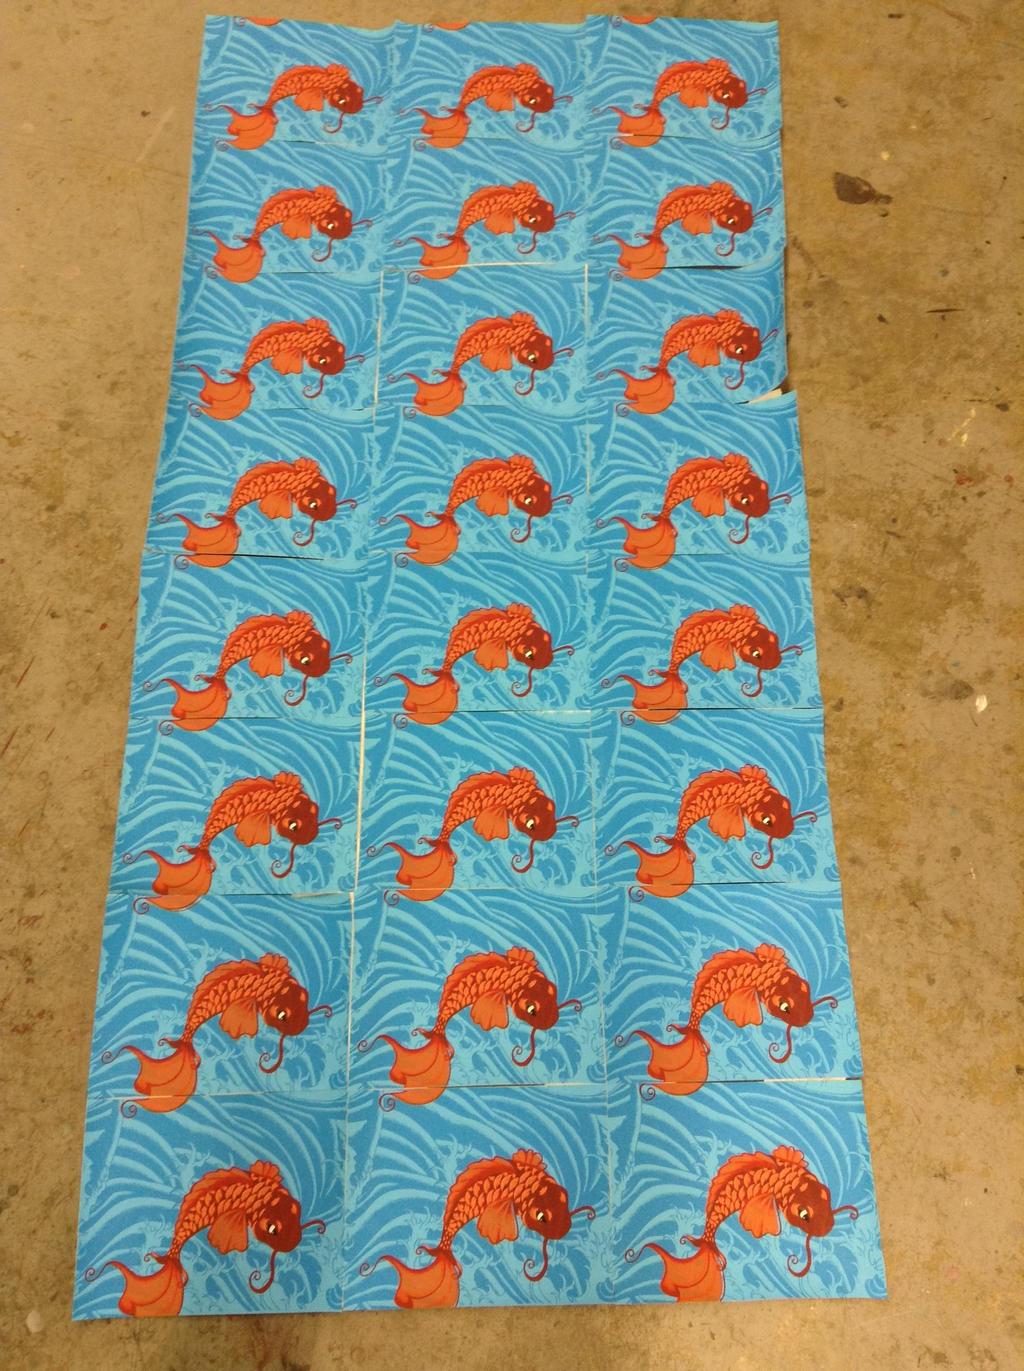 Koi fish prints 4 sale by articwolfspirit on deviantart for Koi prints for sale